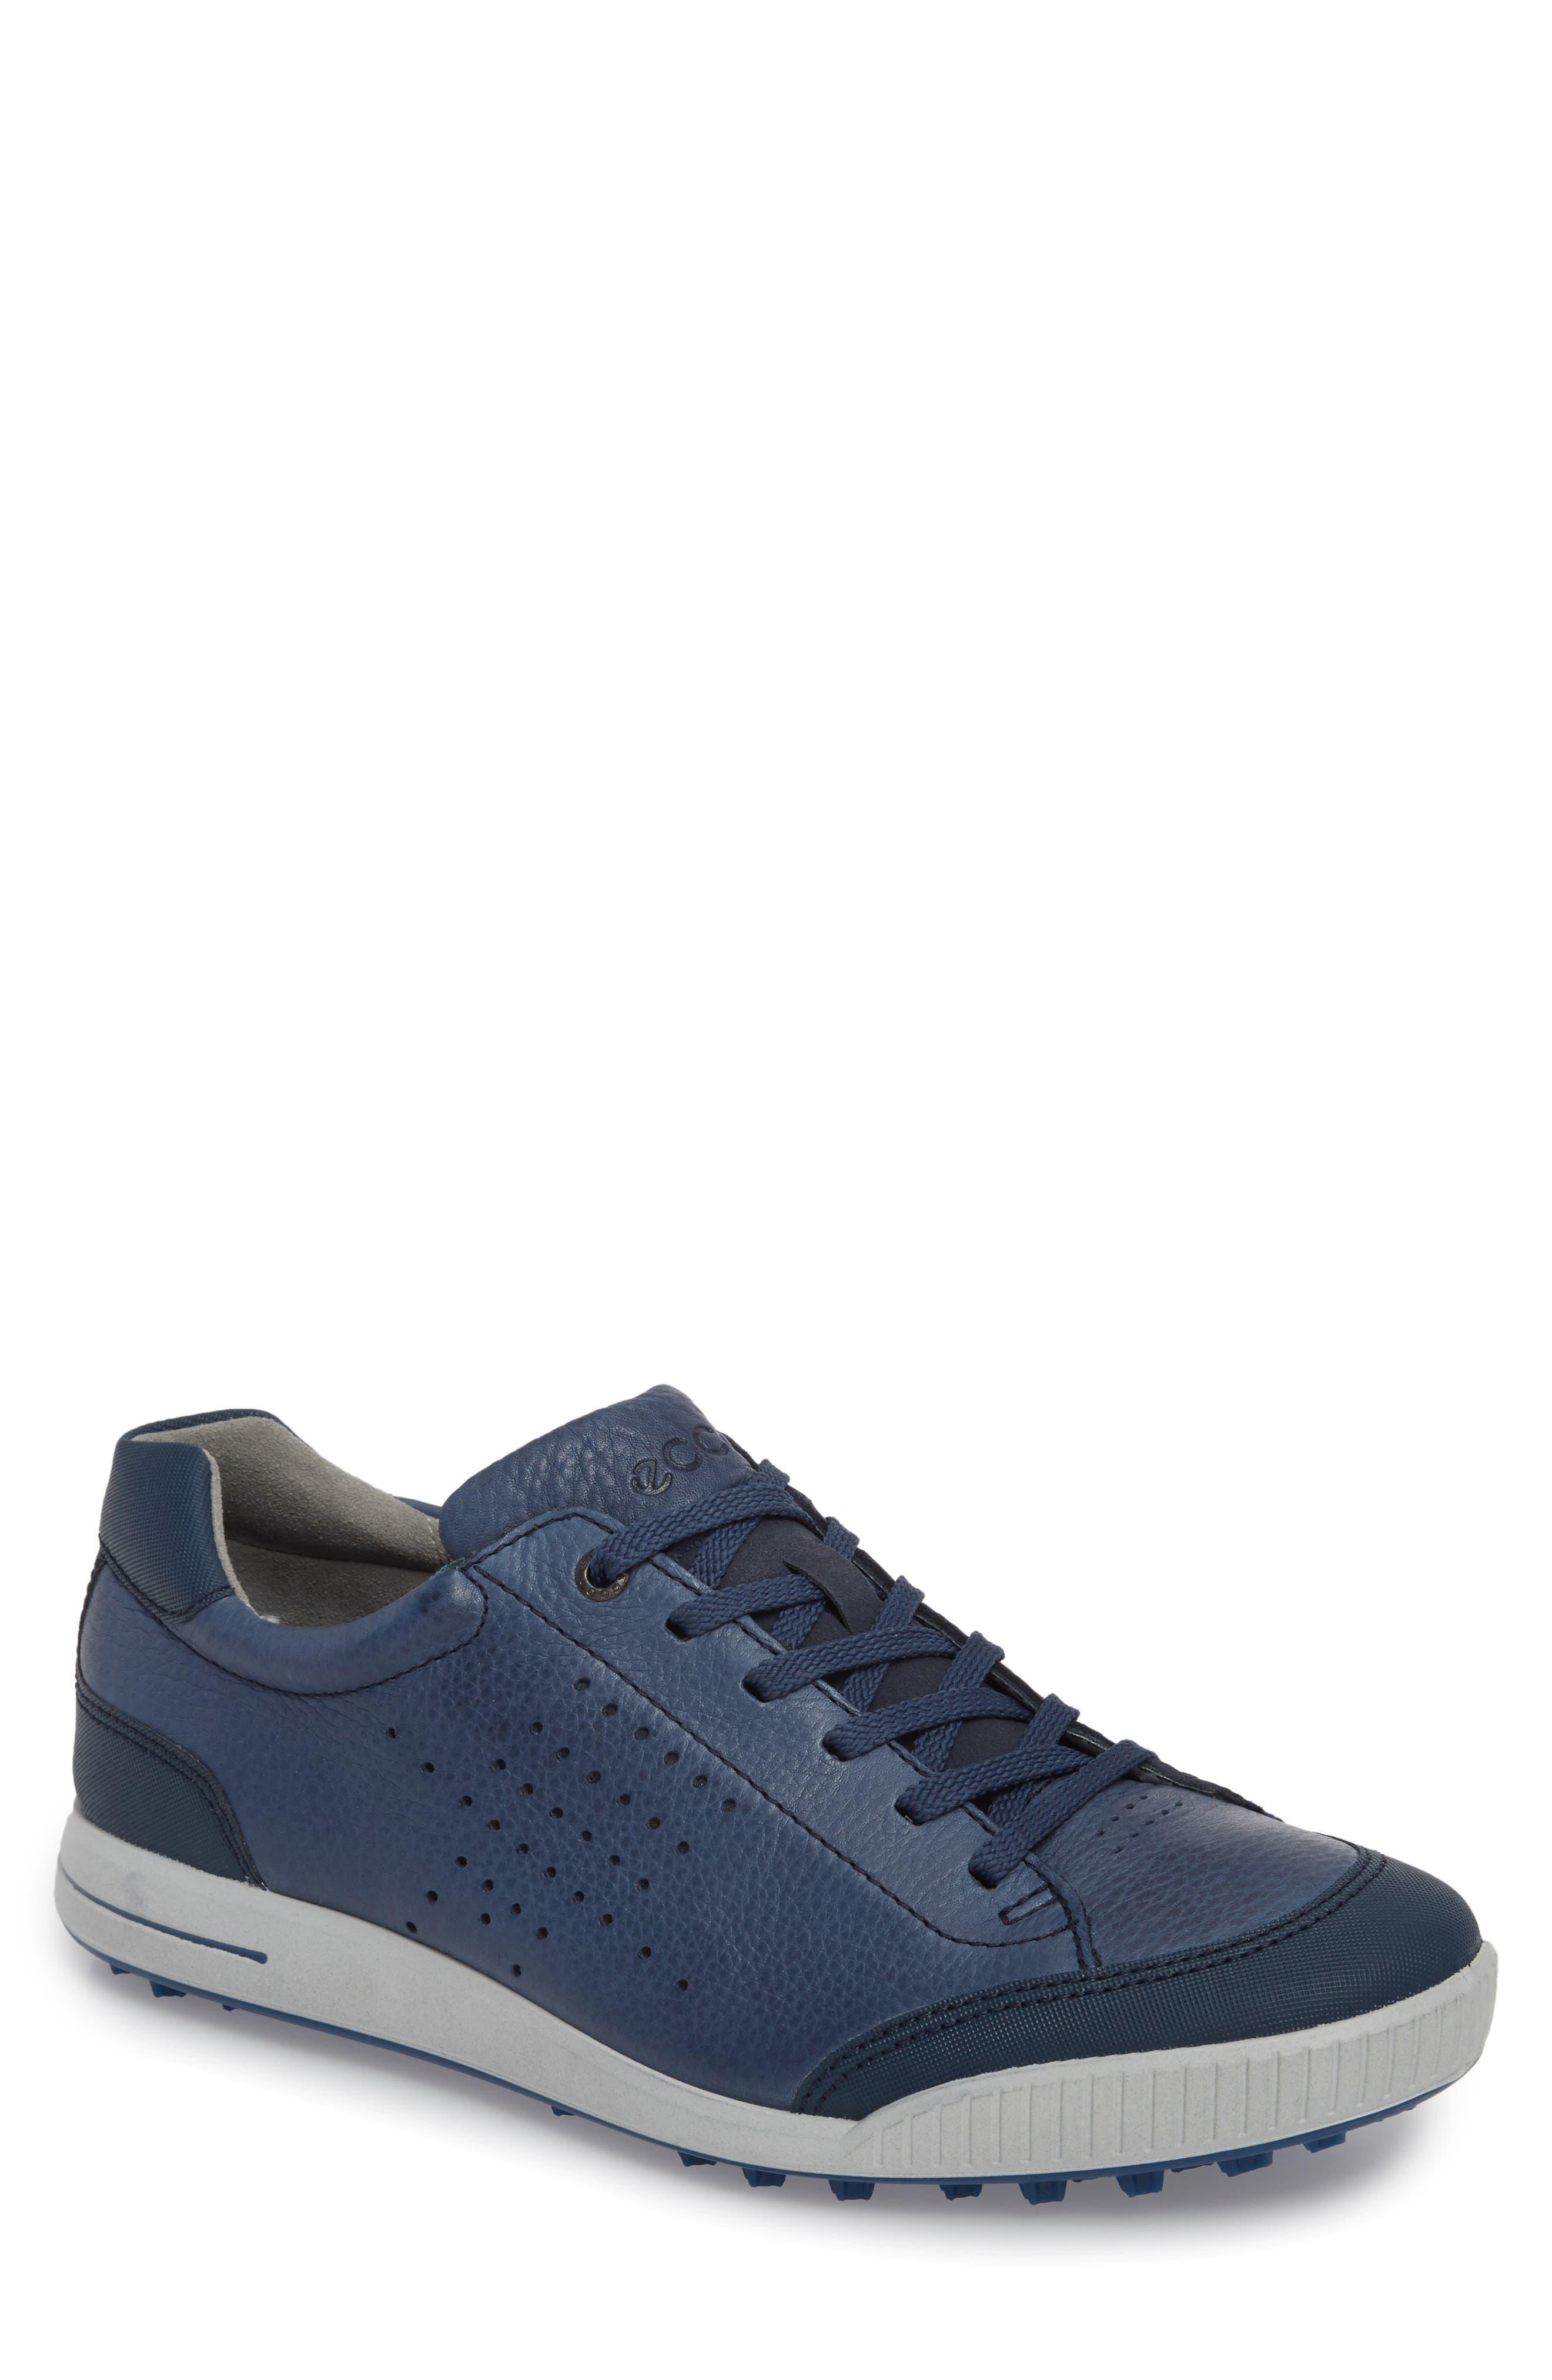 Alternate Image 1 Selected - ECCO Street Retro HM Golf Shoe (Men)